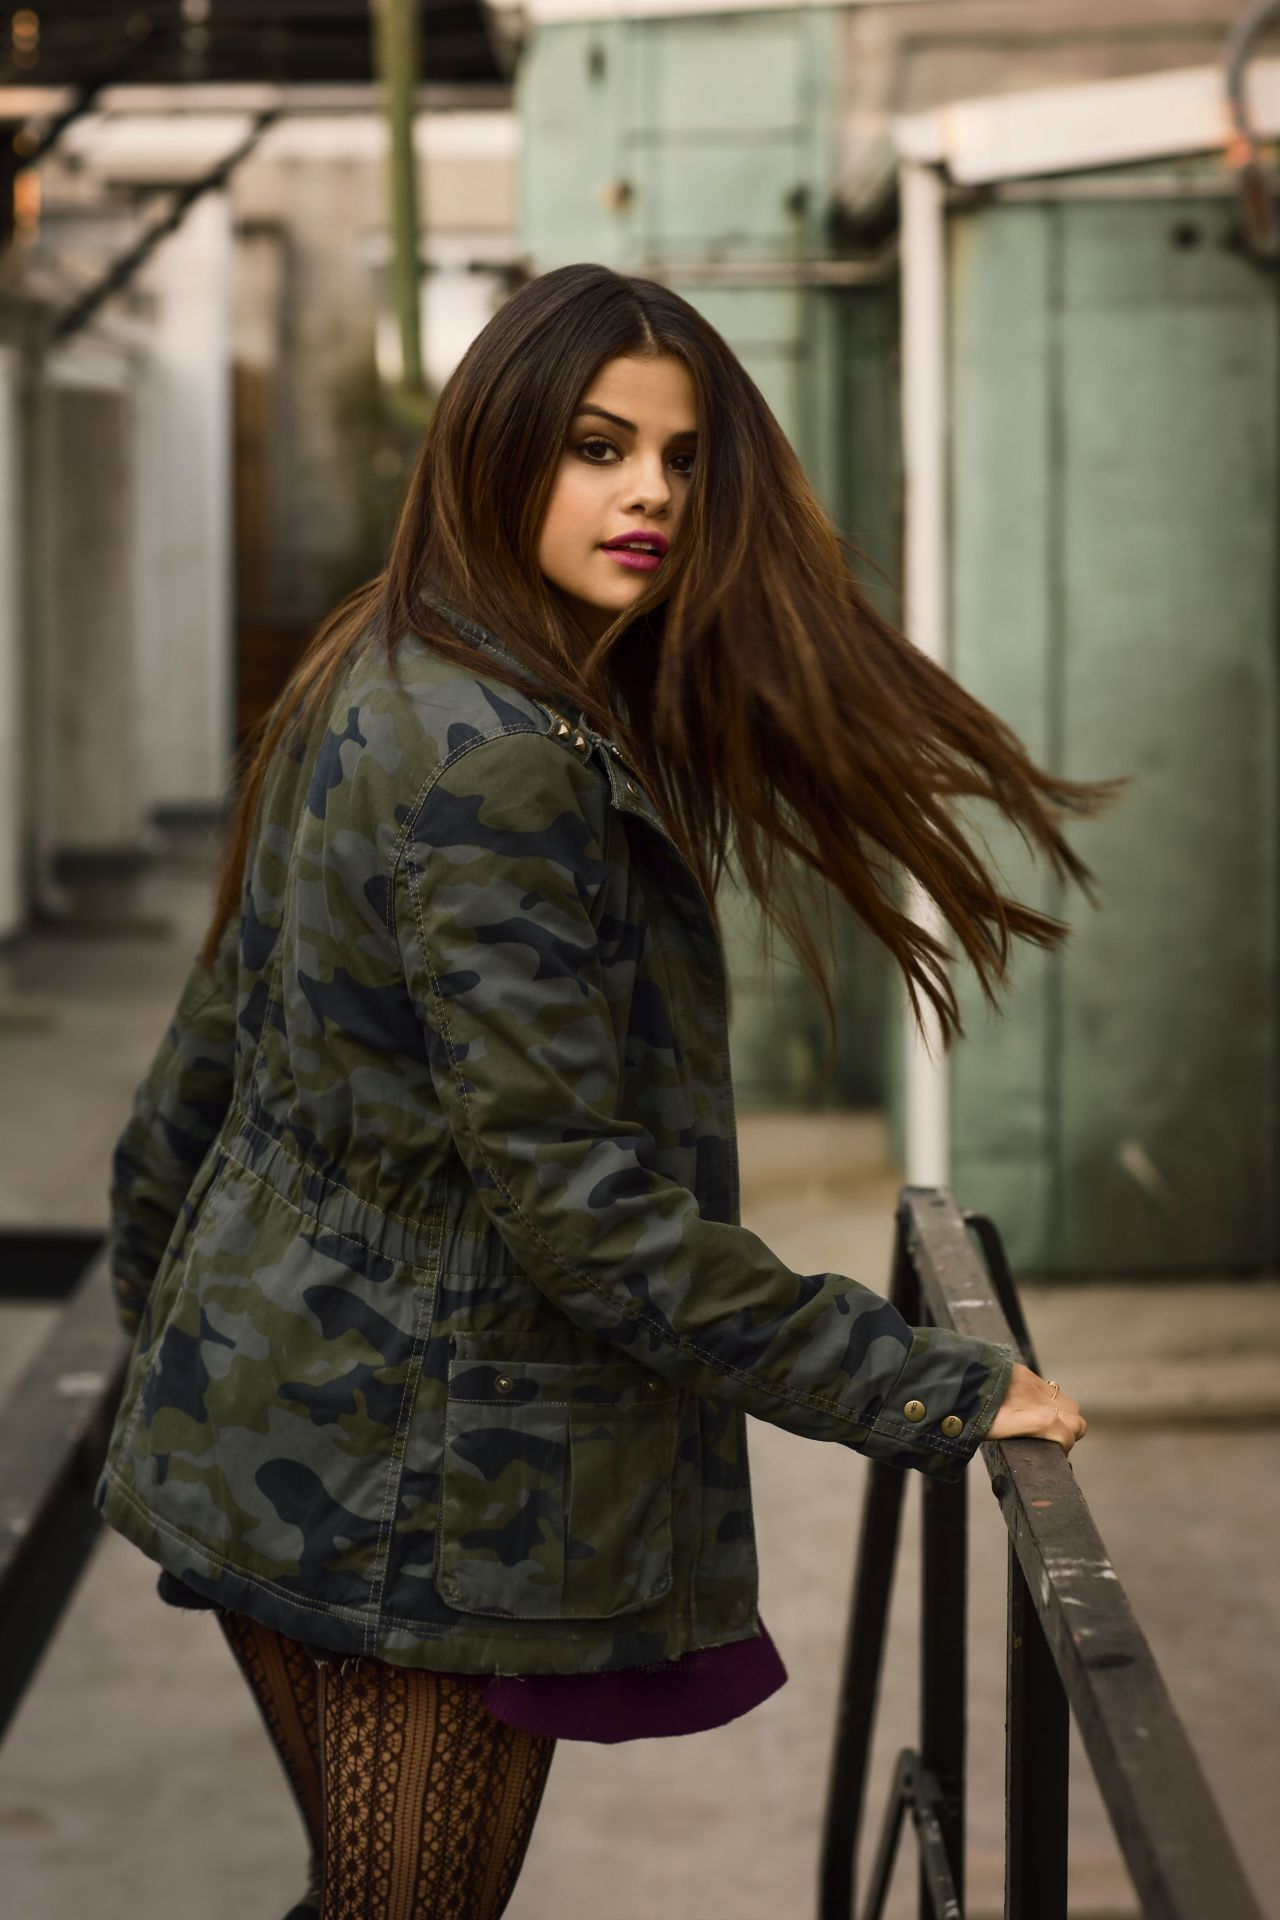 Selena gomez photoshoot for adidas neo winter 2014 - Photo selena gomez 2014 ...